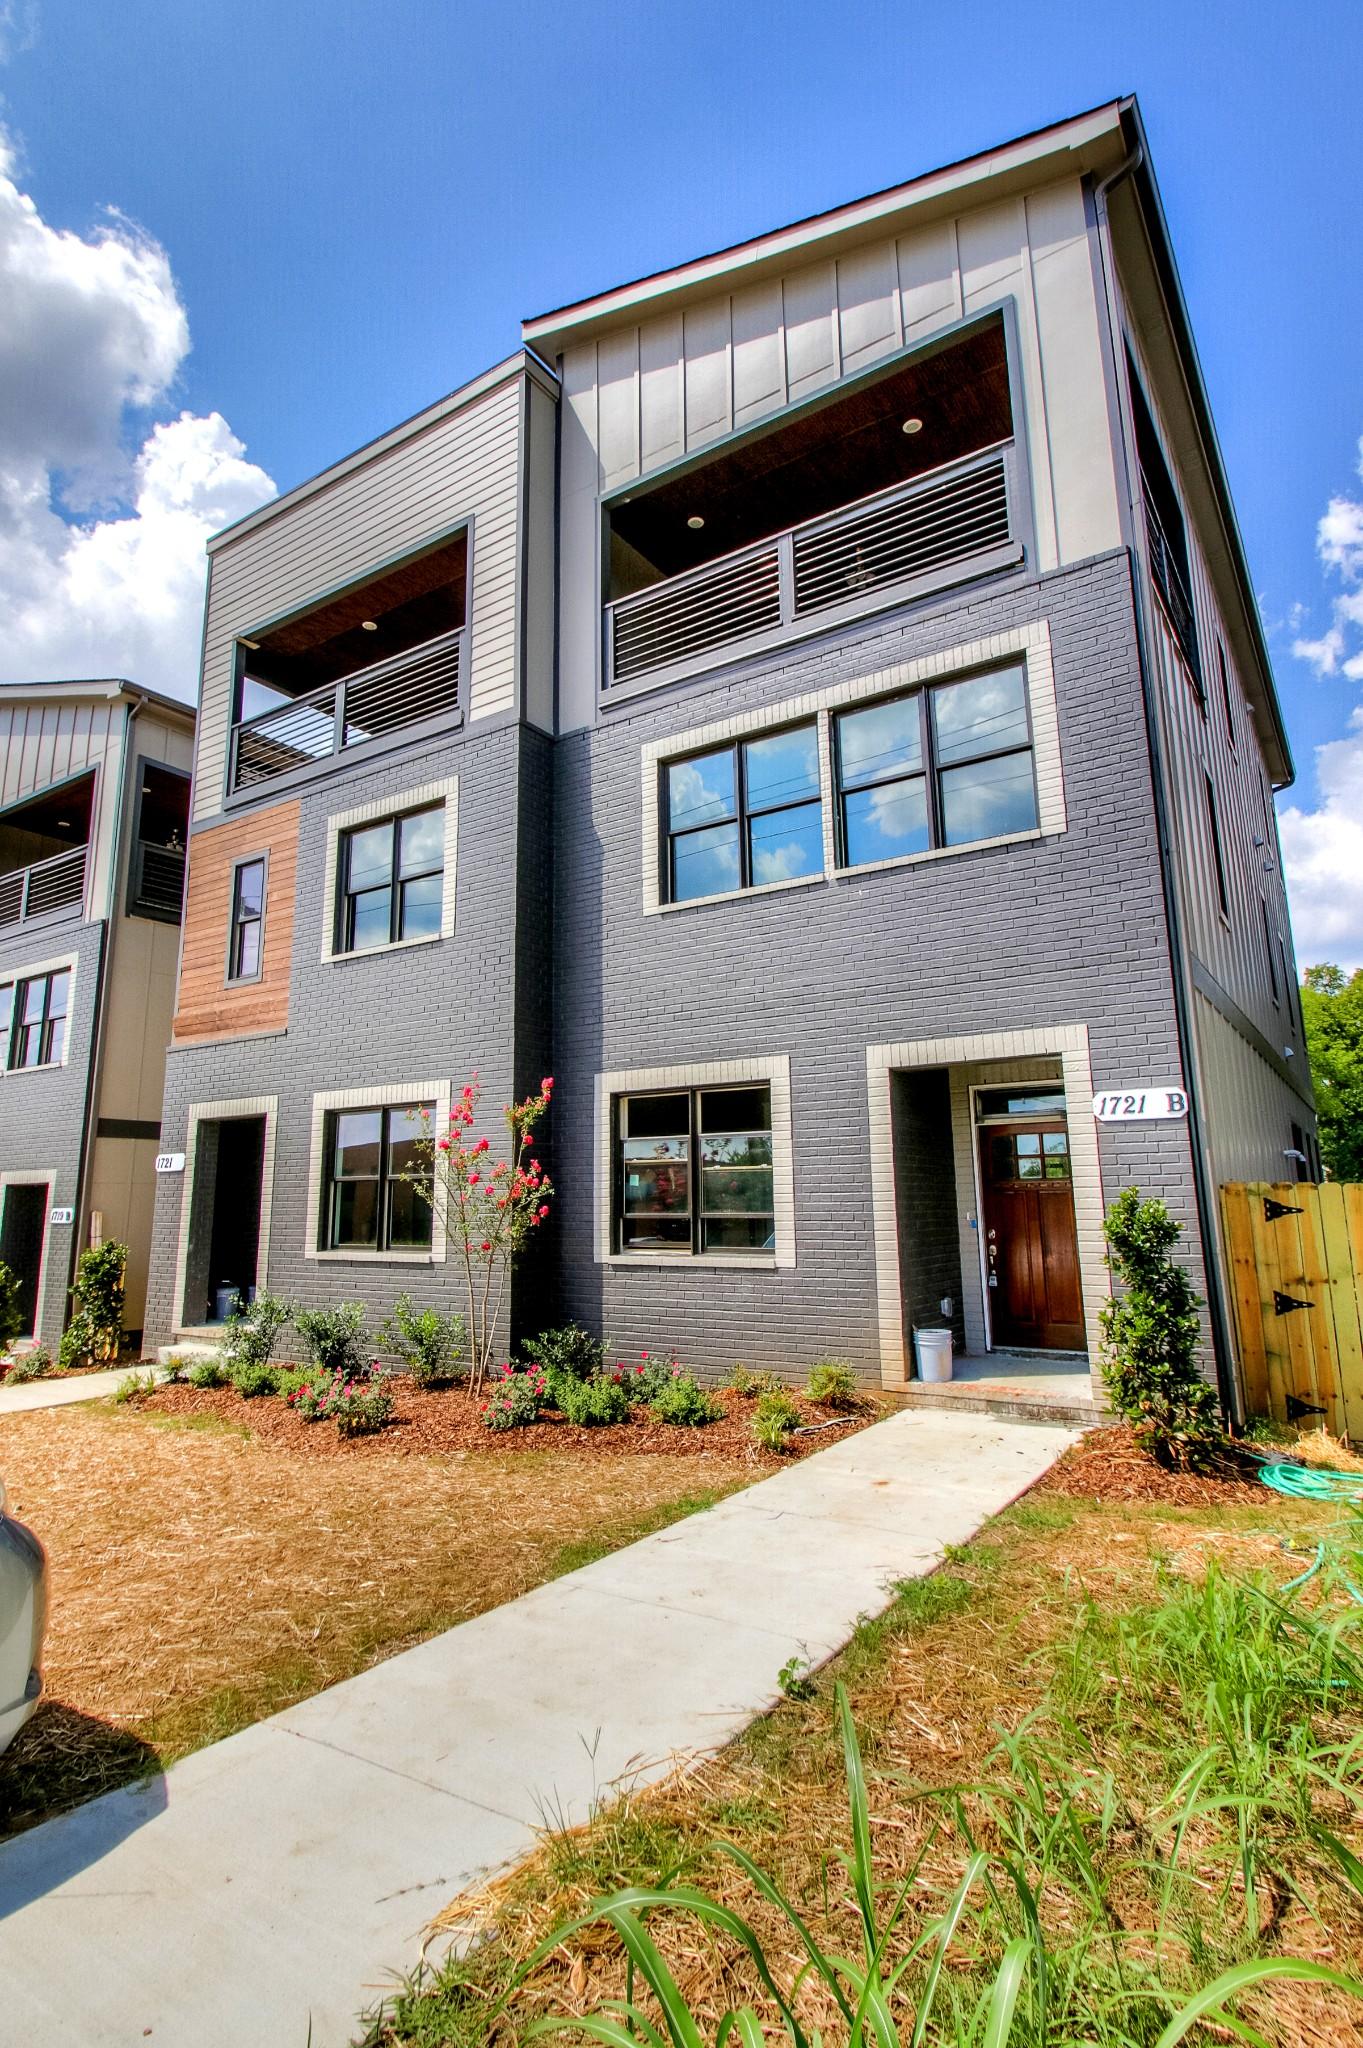 1721B 3rd Ave, N, Nashville, TN 37208 - Nashville, TN real estate listing